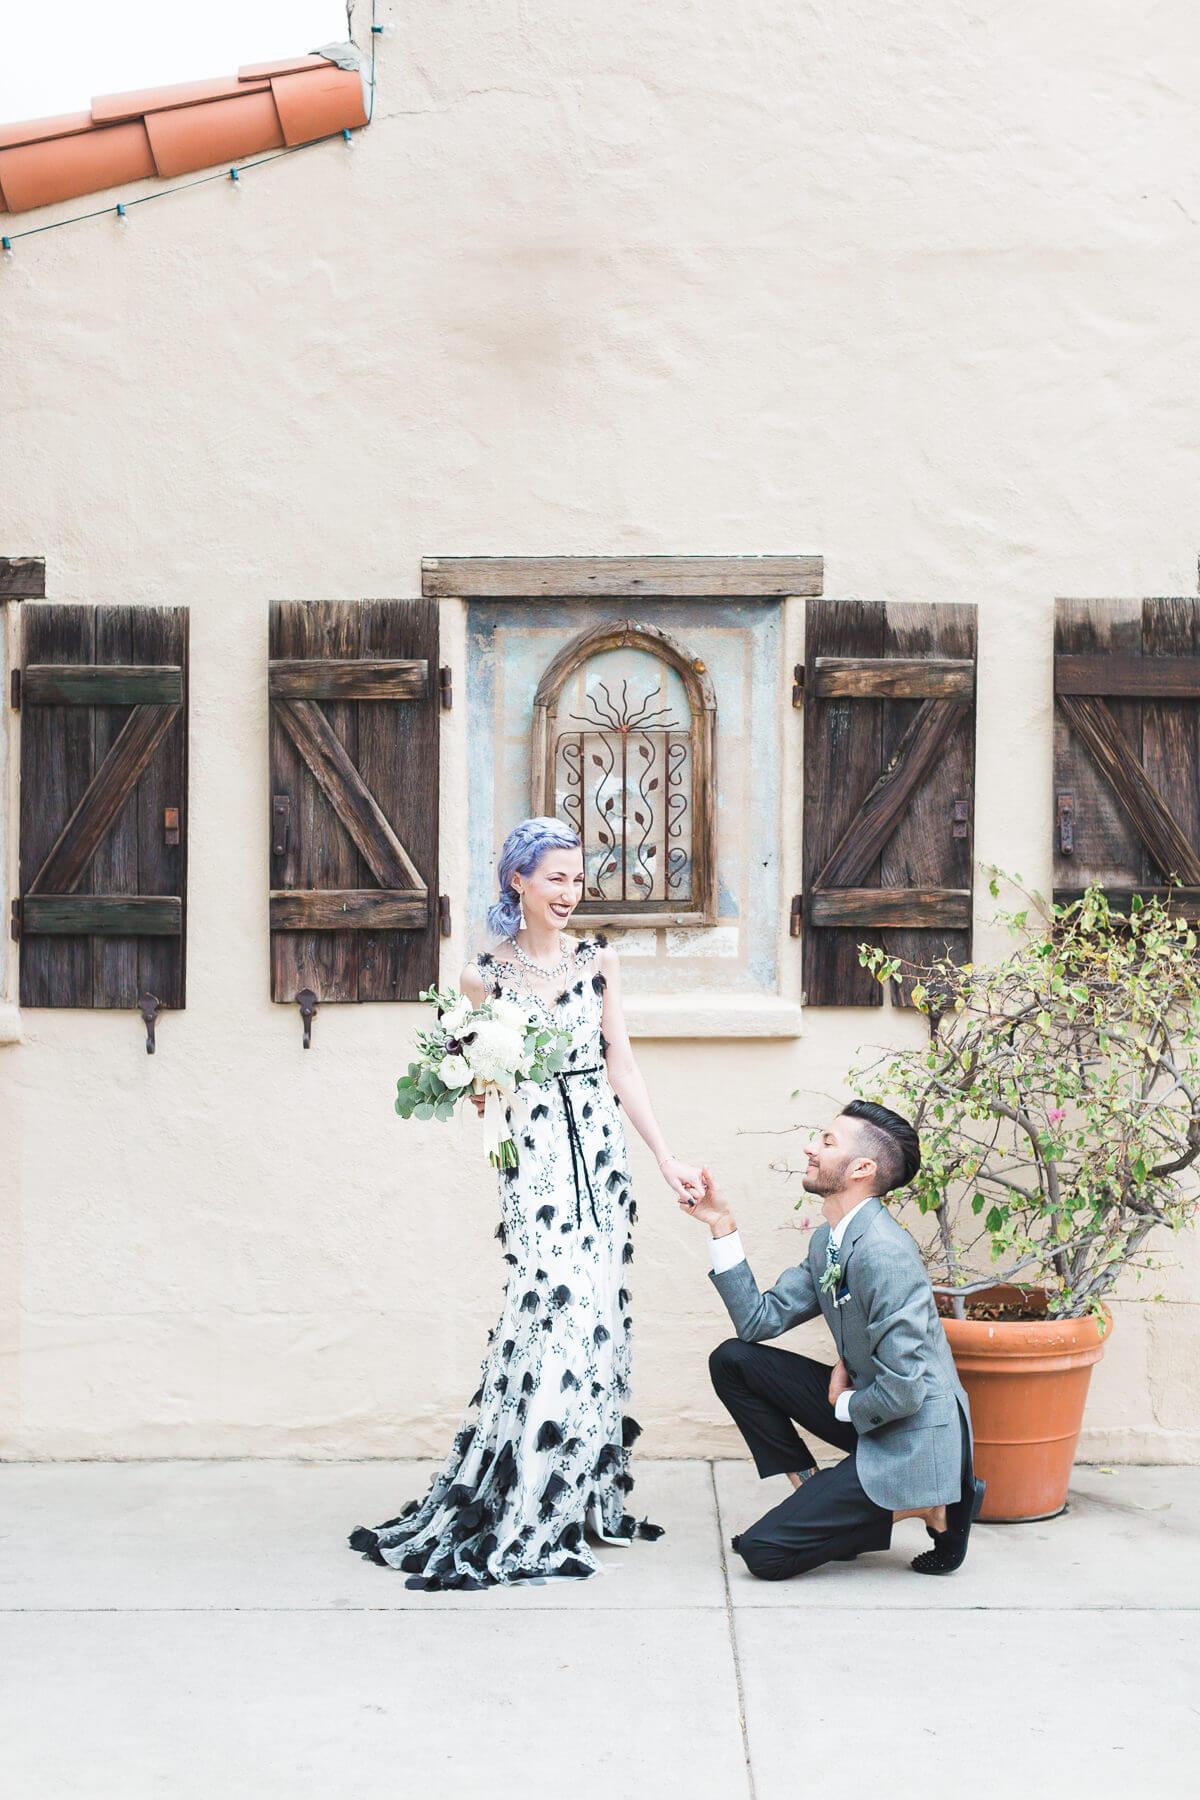 a-the_light_and_glass-wedding-photography-kim-jon-03.jpg